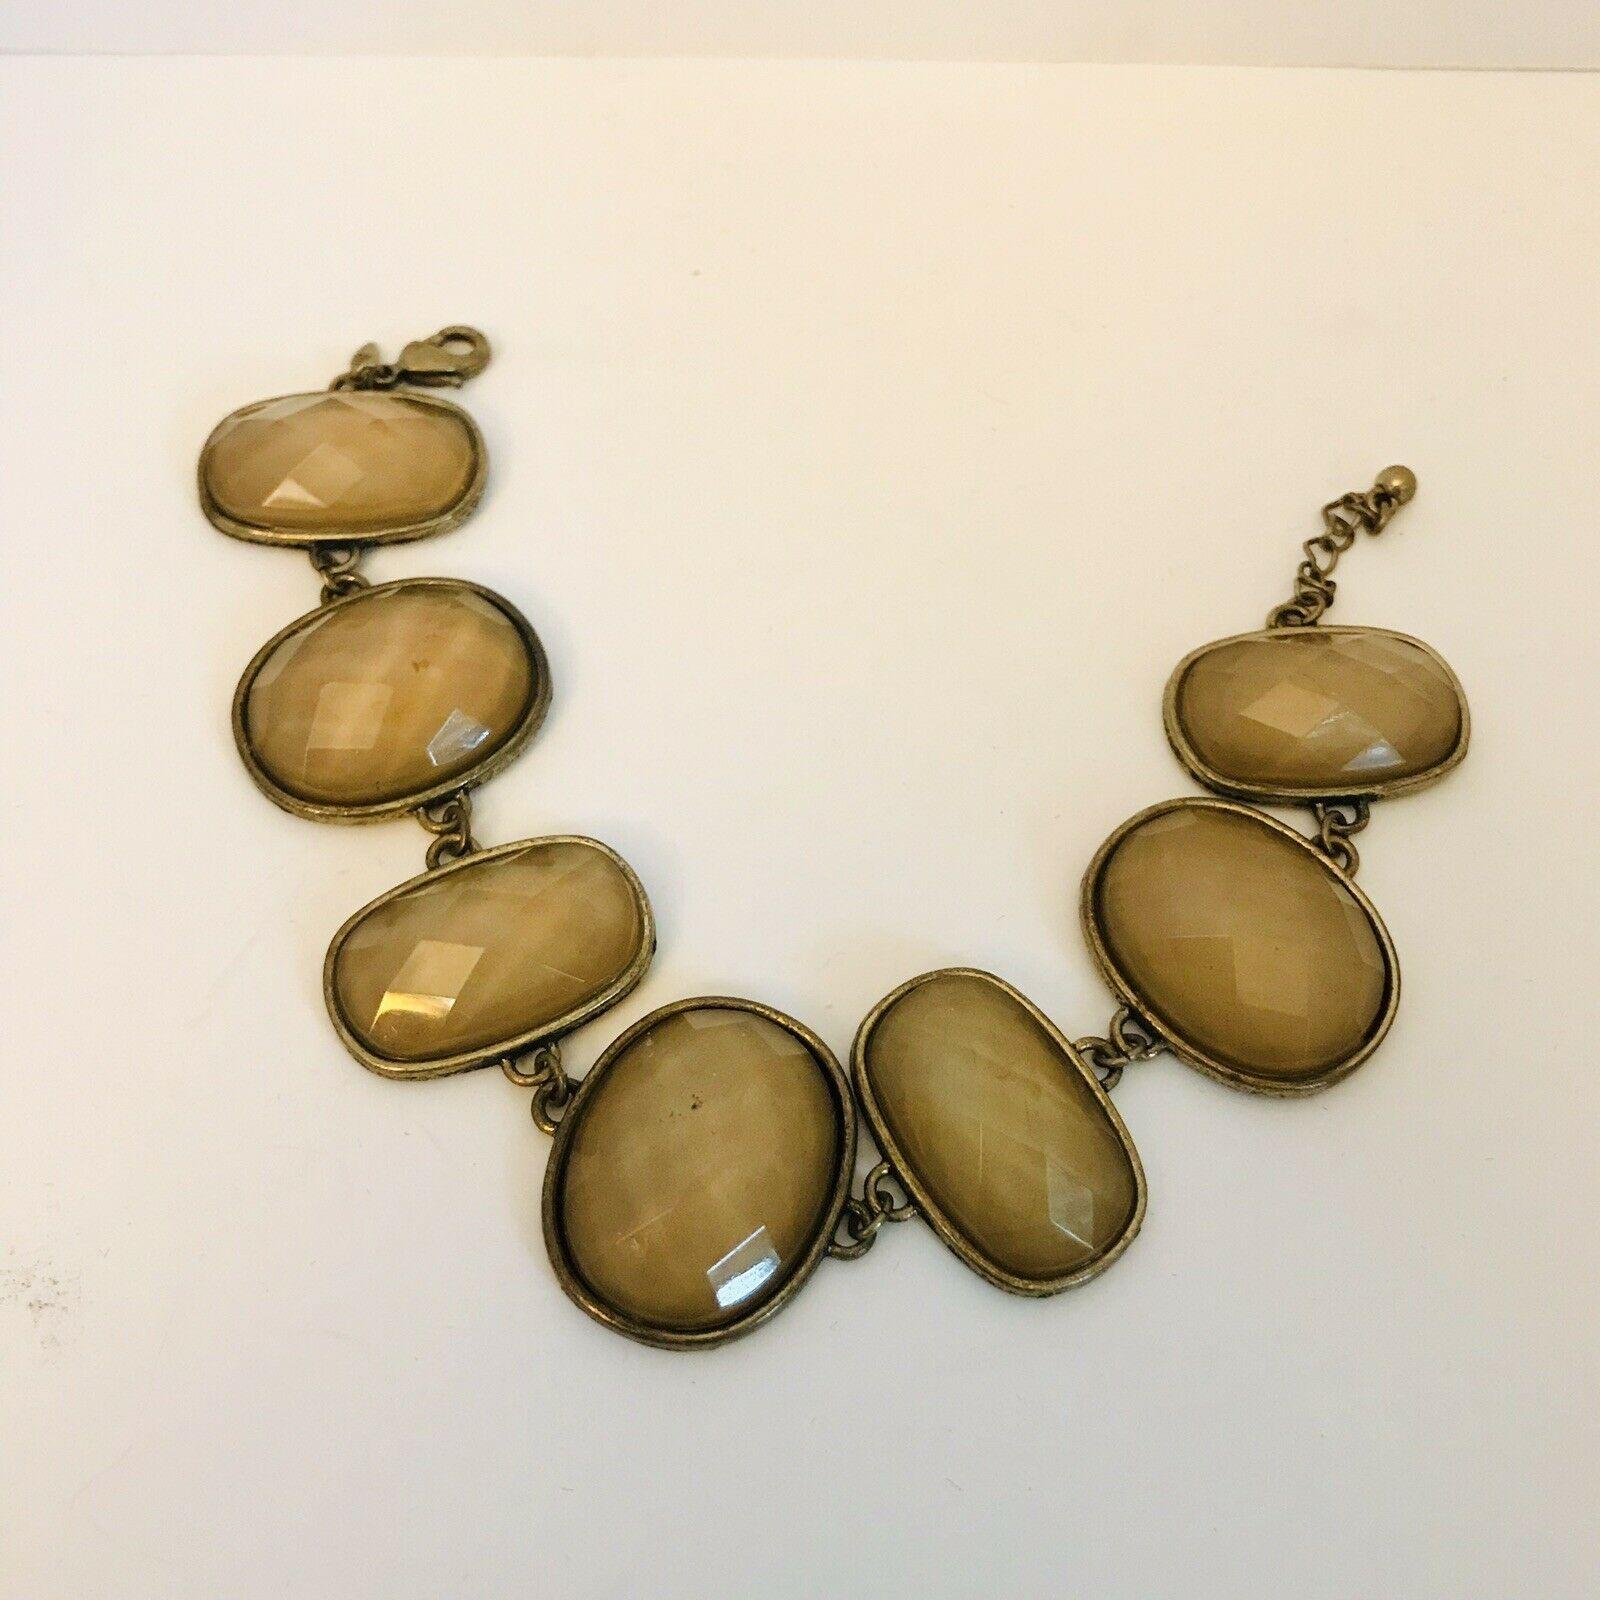 Vintage Avon SH Bronze Tone Faceted Stone Link Bracelet J0725 image 3